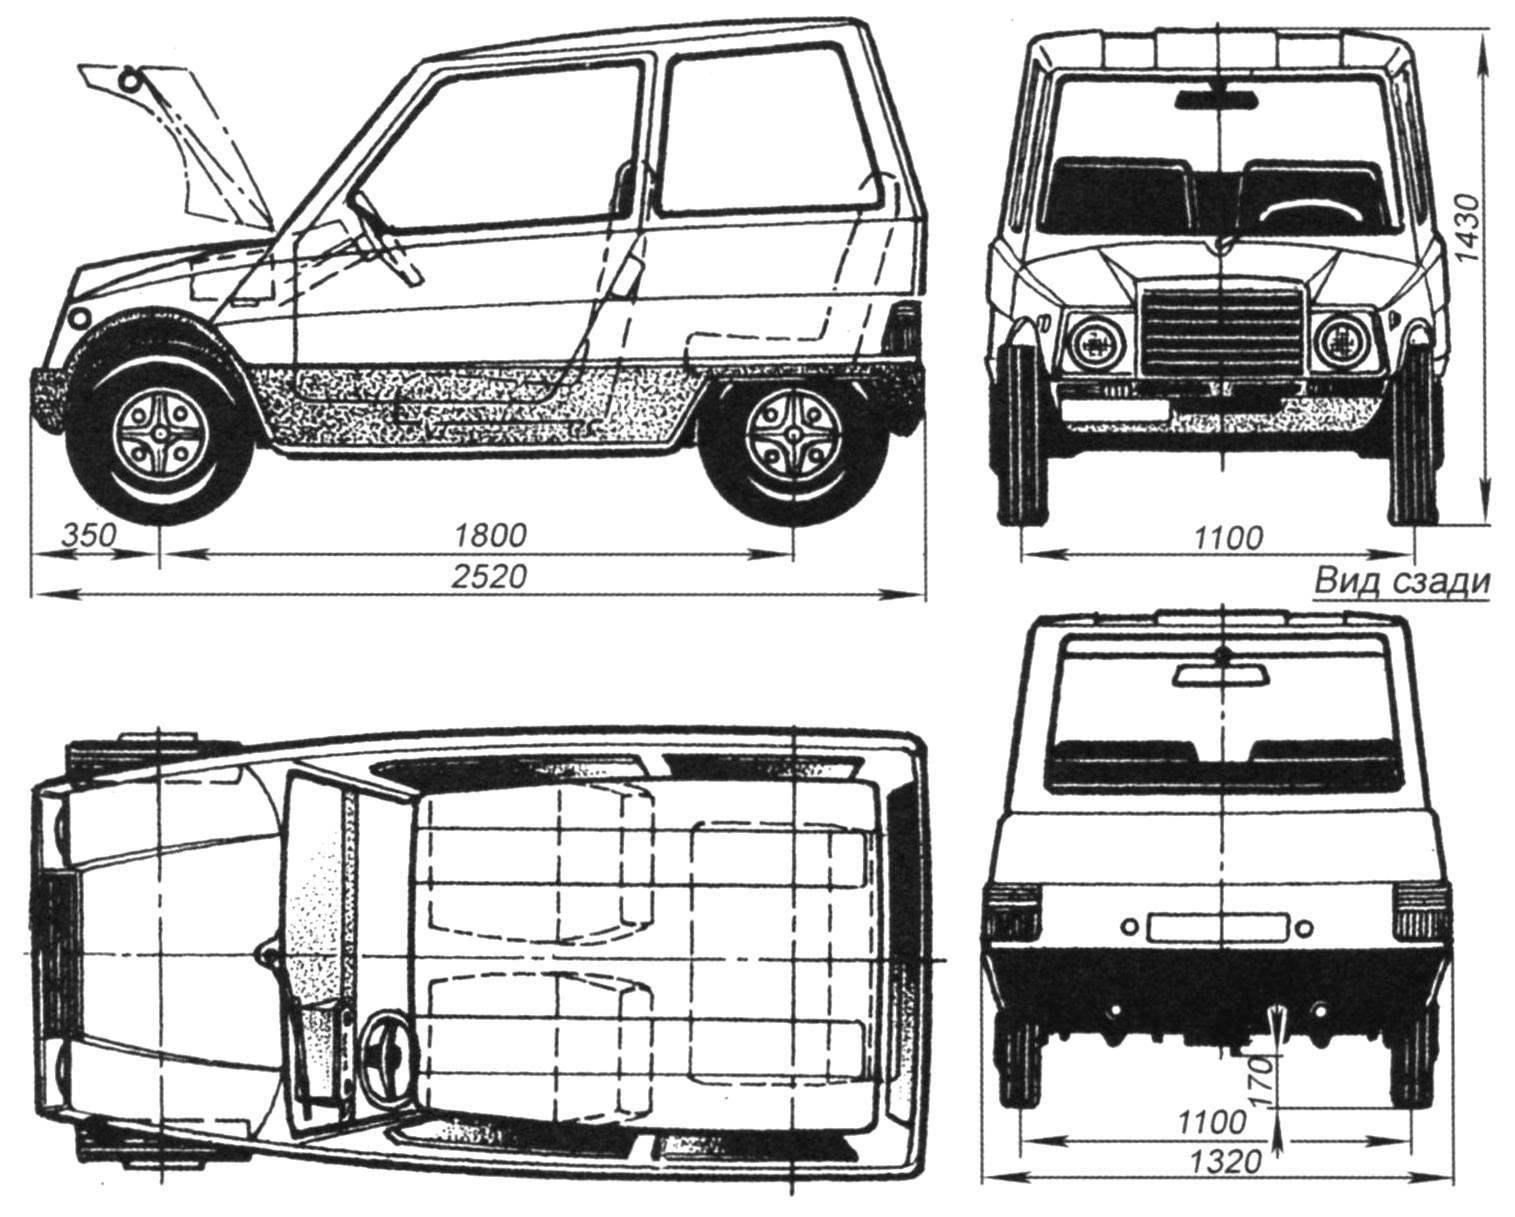 Urban subcompact vehicle type